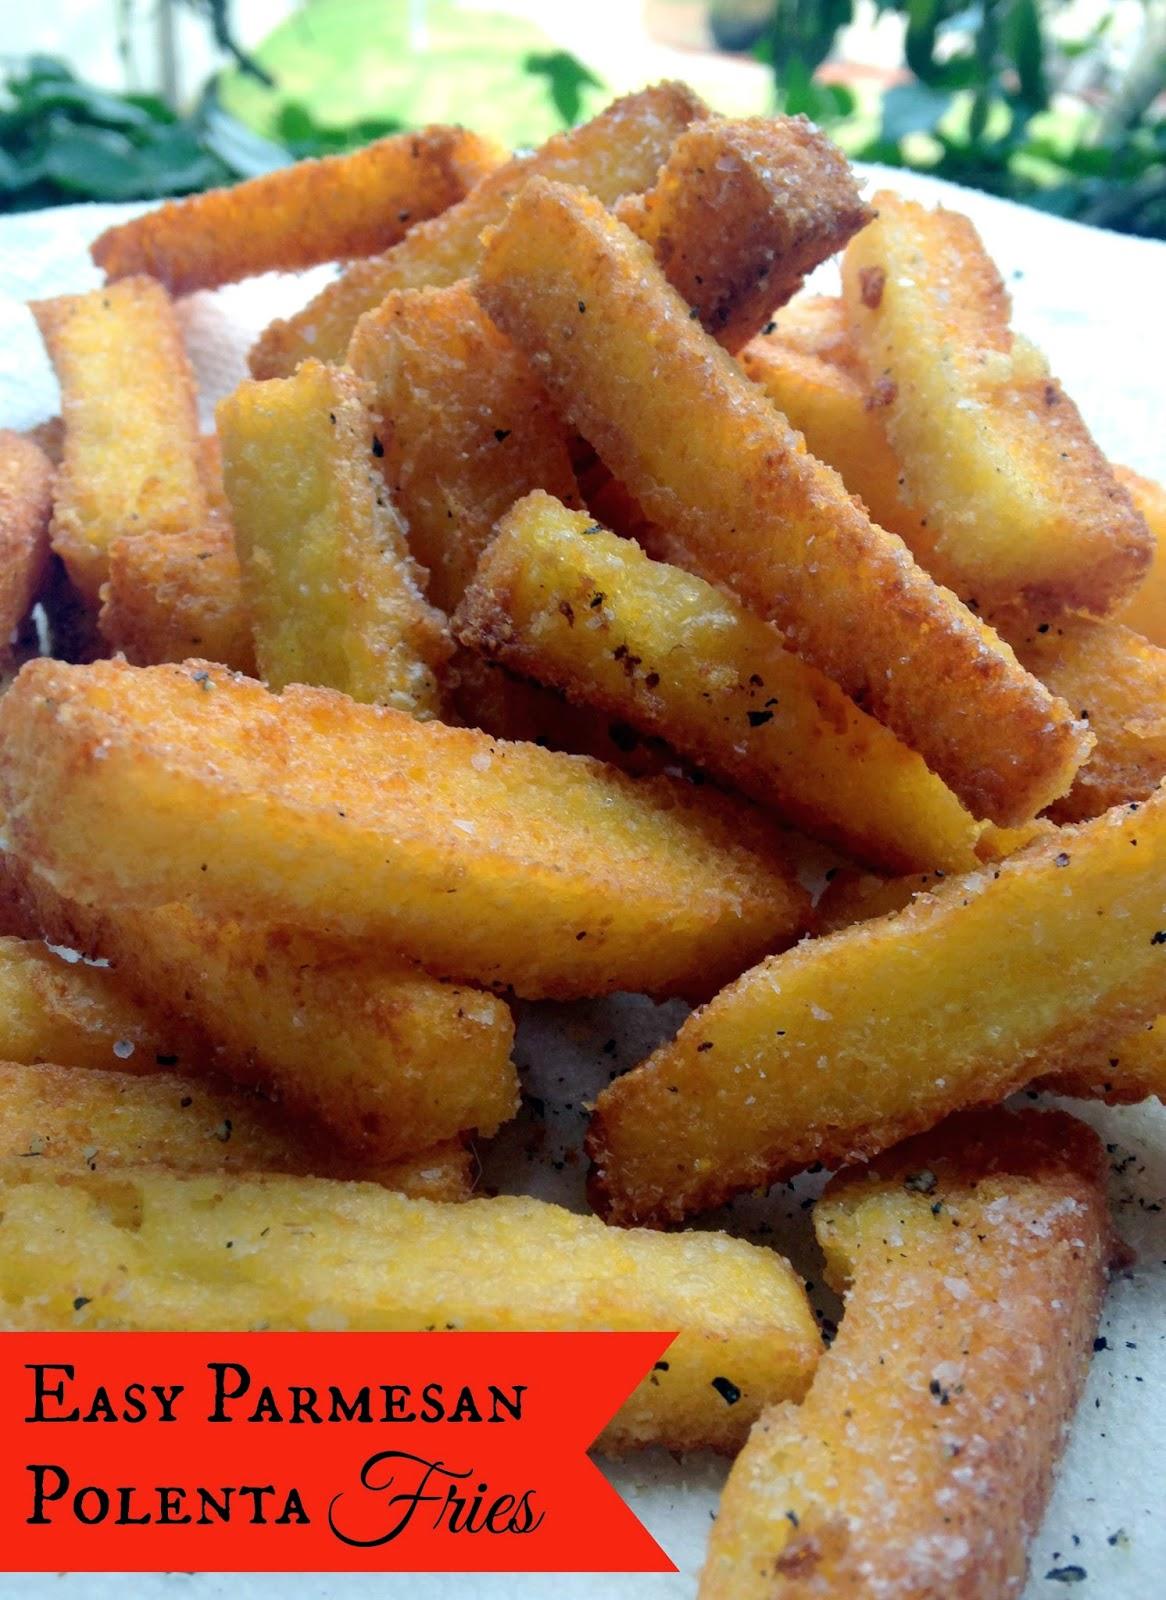 Easy & Amazing Parmesan Polenta Fries